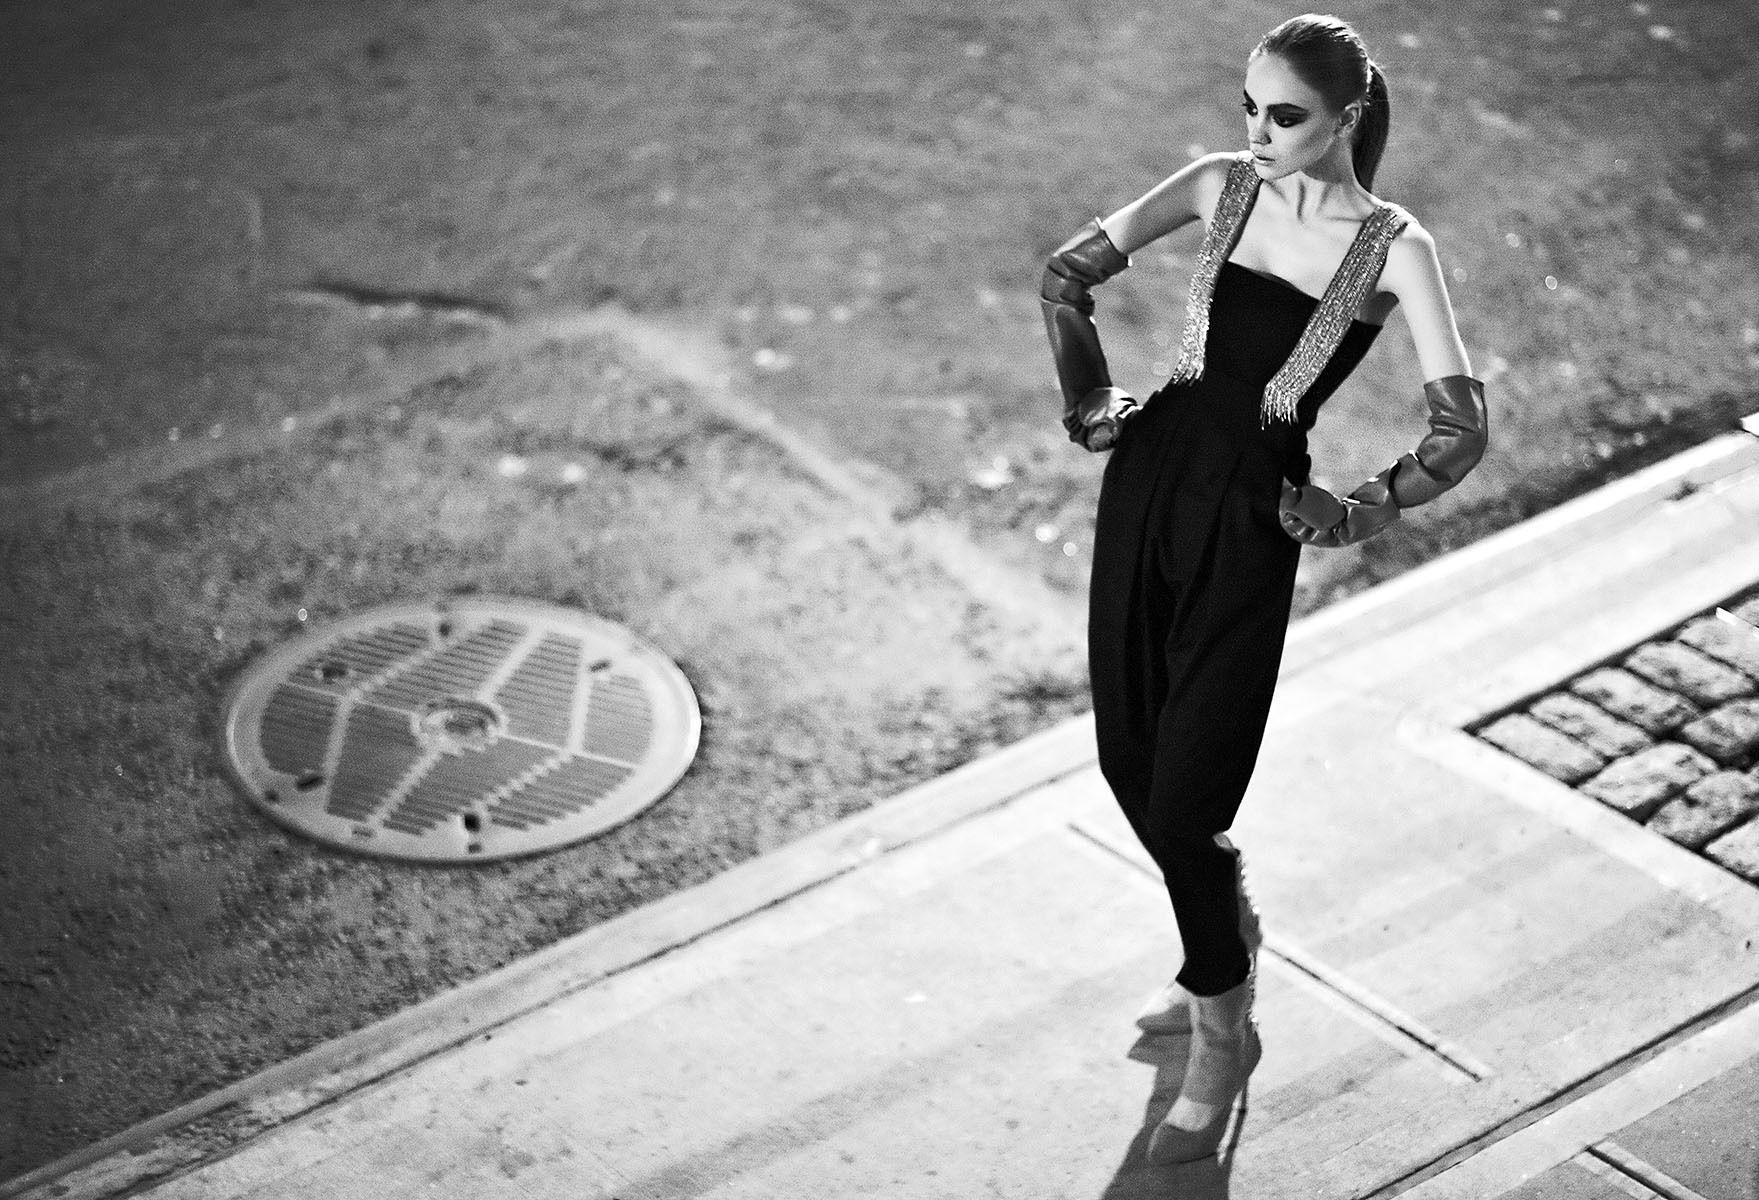 Model: Veronika Antsipava